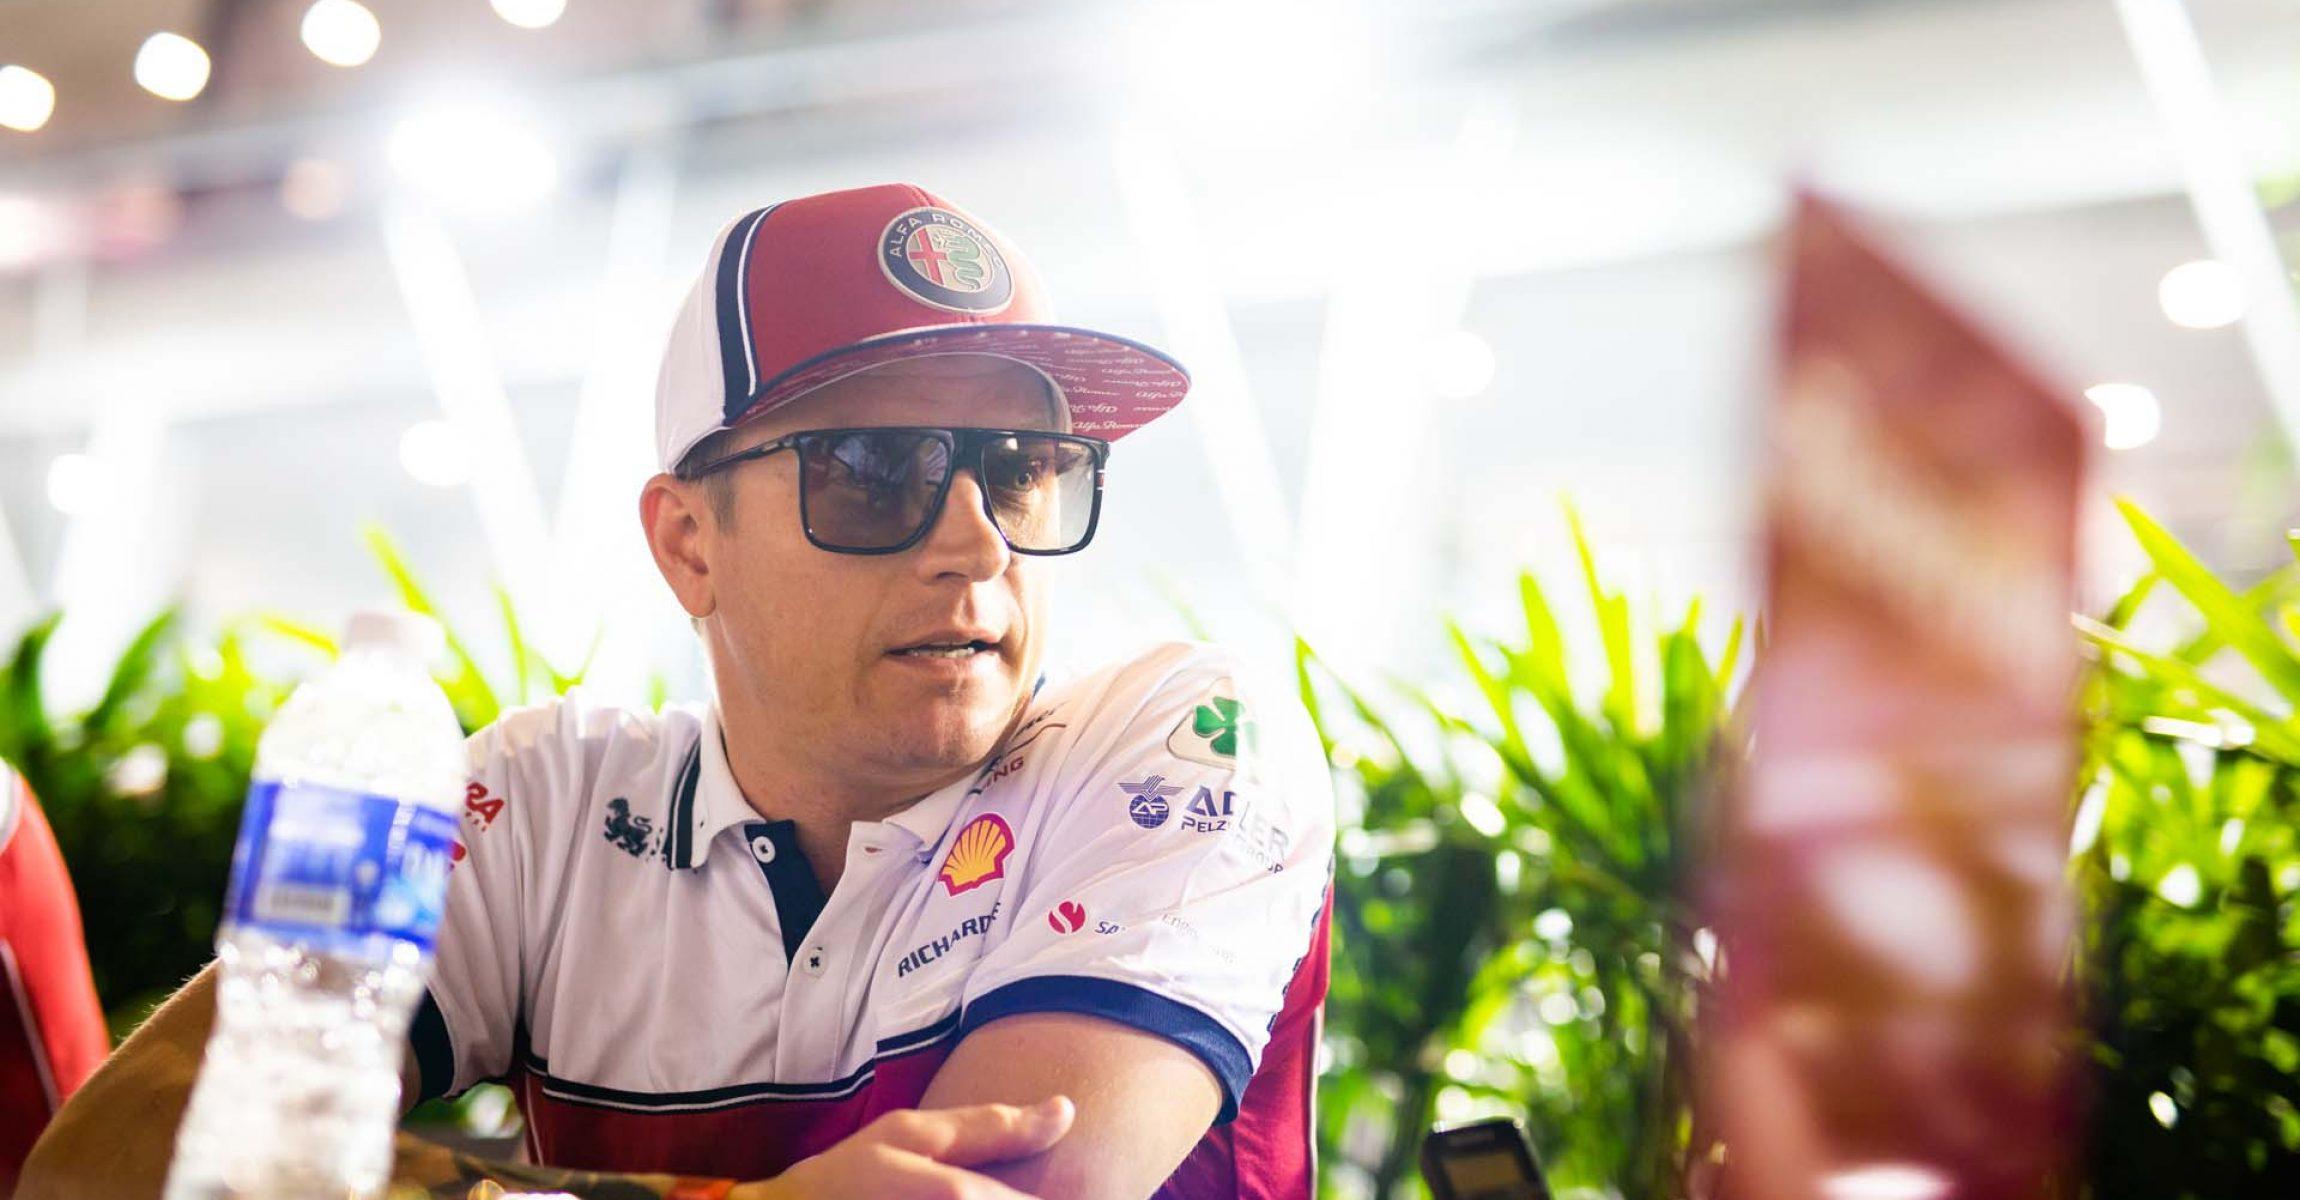 RAIKKONEN Kimi Räikkönen (fin), Alfa Romeo Racing C38, portrait during the 2019 Formula One World Championship, Singapore Grand Prix from September 19 to 22 in Singapour - Photo Antonin Vincent / DPPI